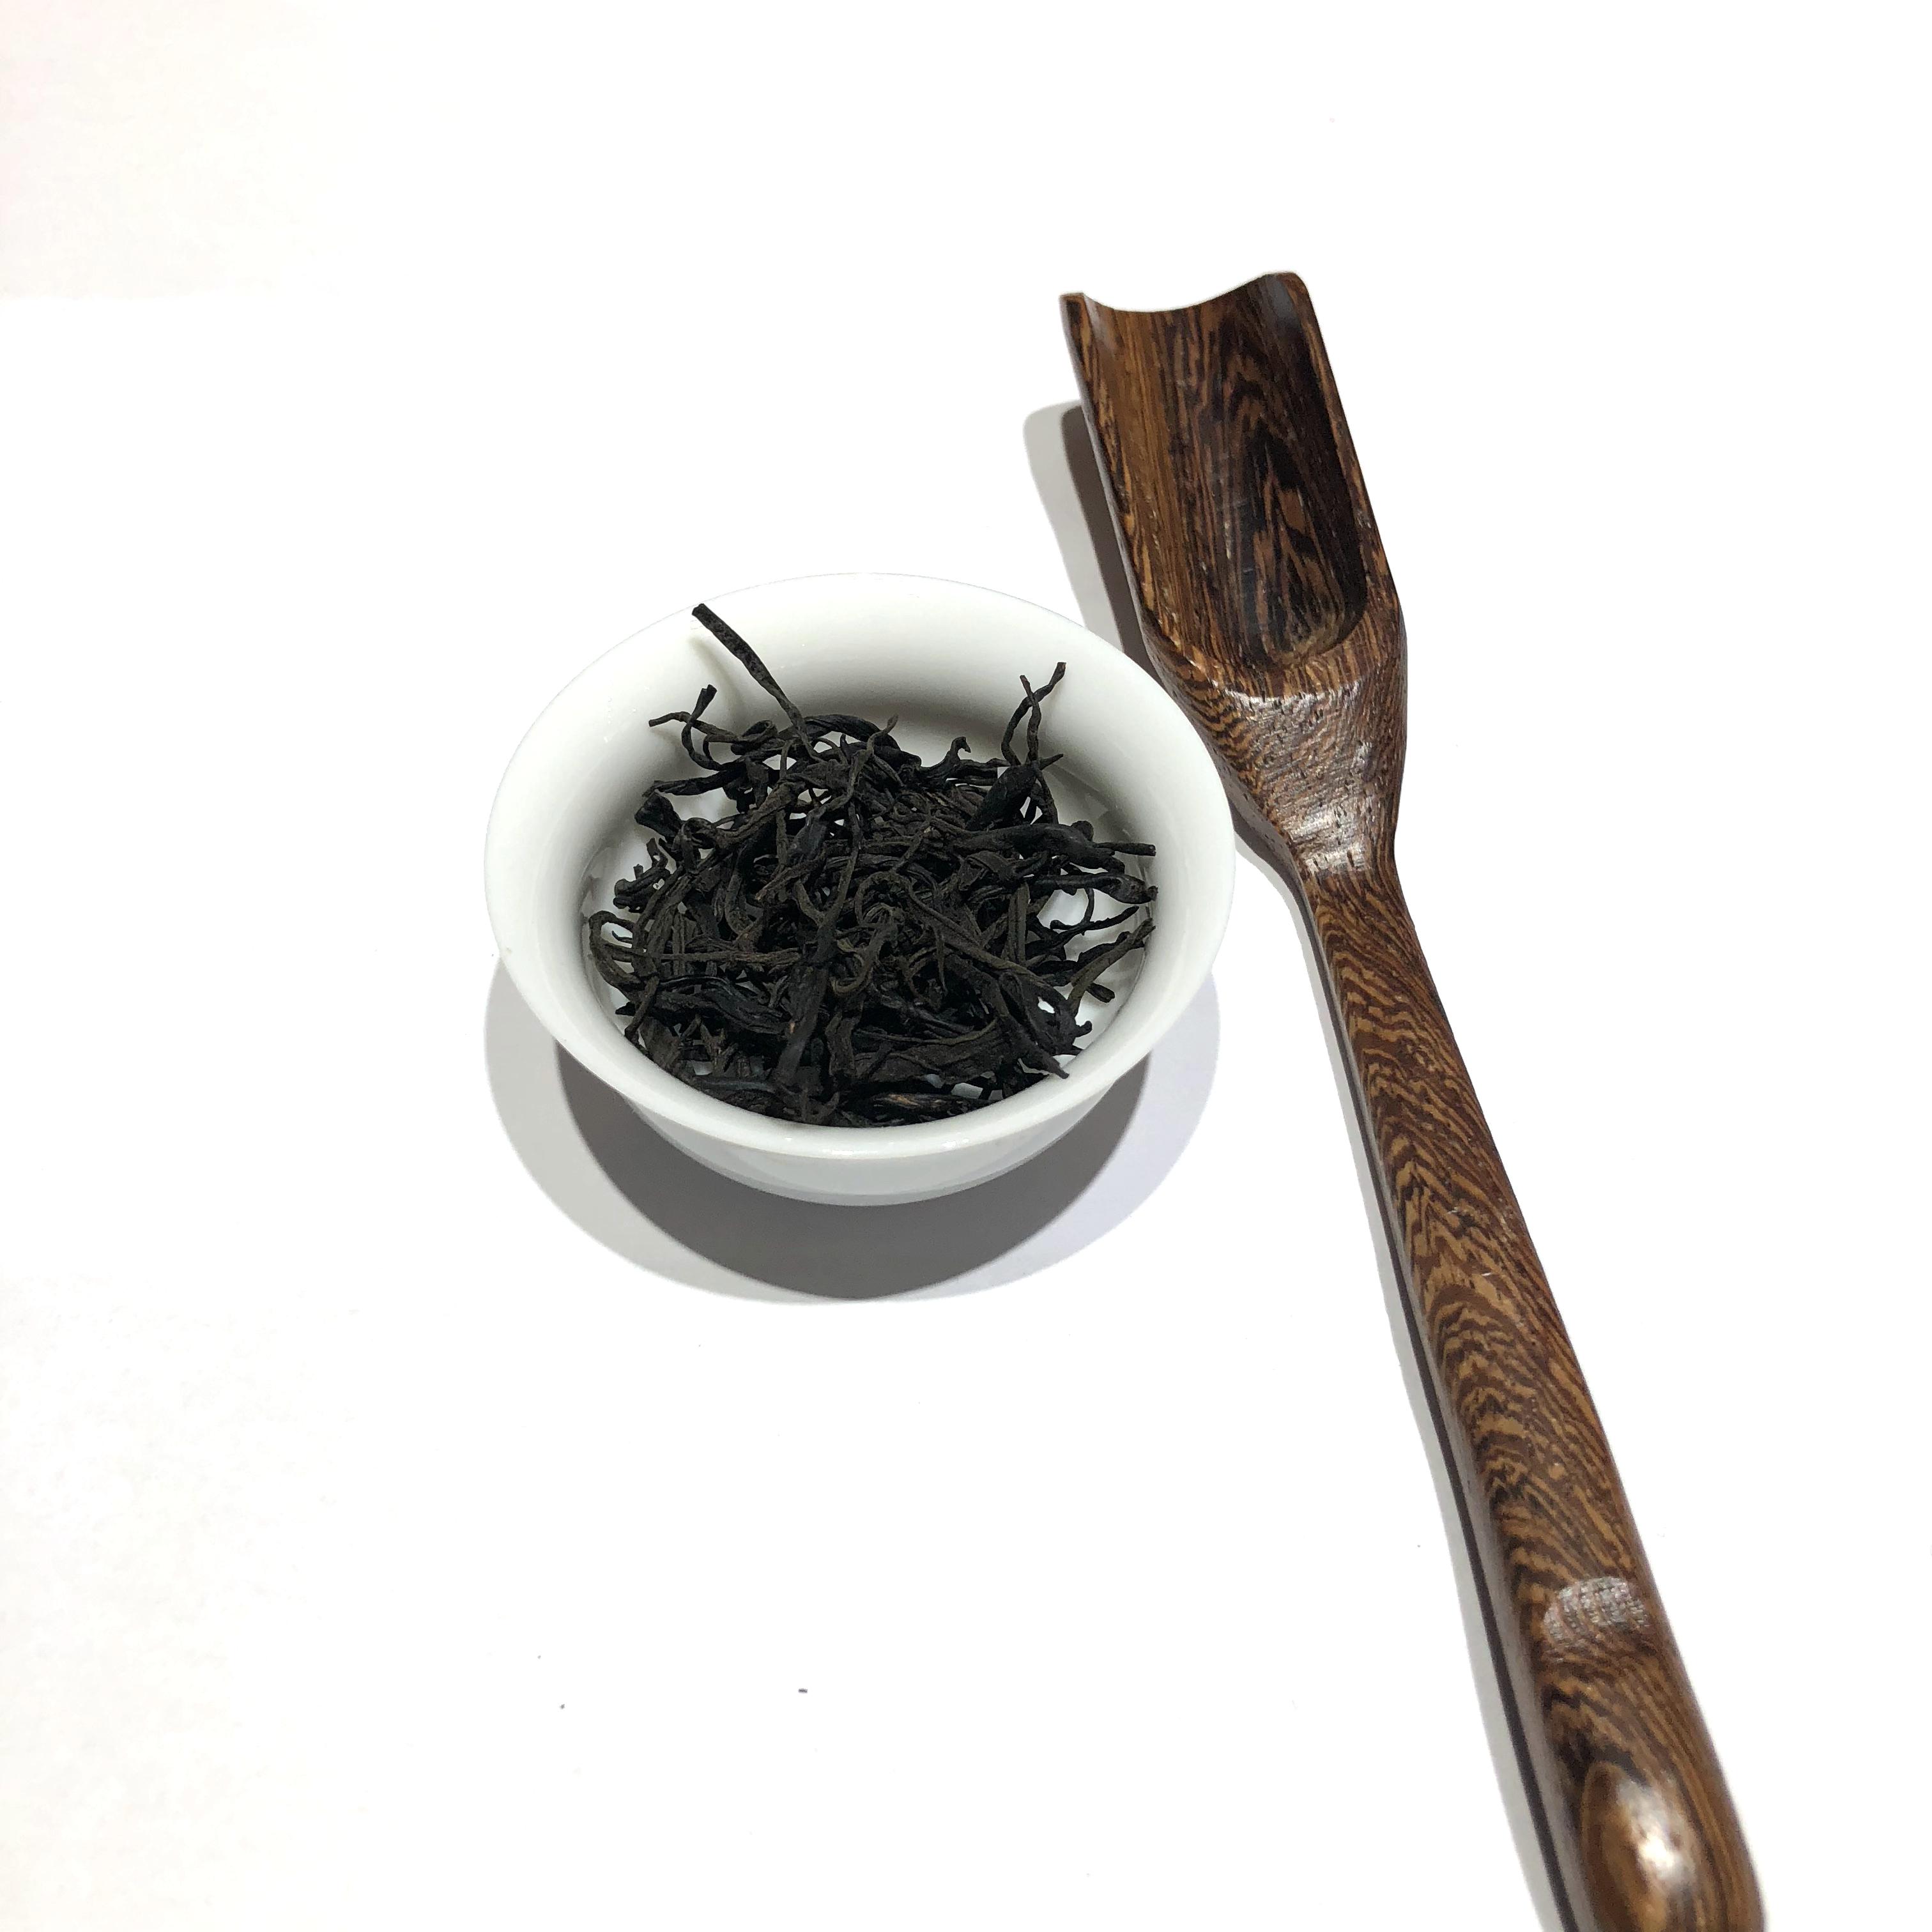 High quality Guizhou Meitan a best black tea brand fine black tea - 4uTea | 4uTea.com